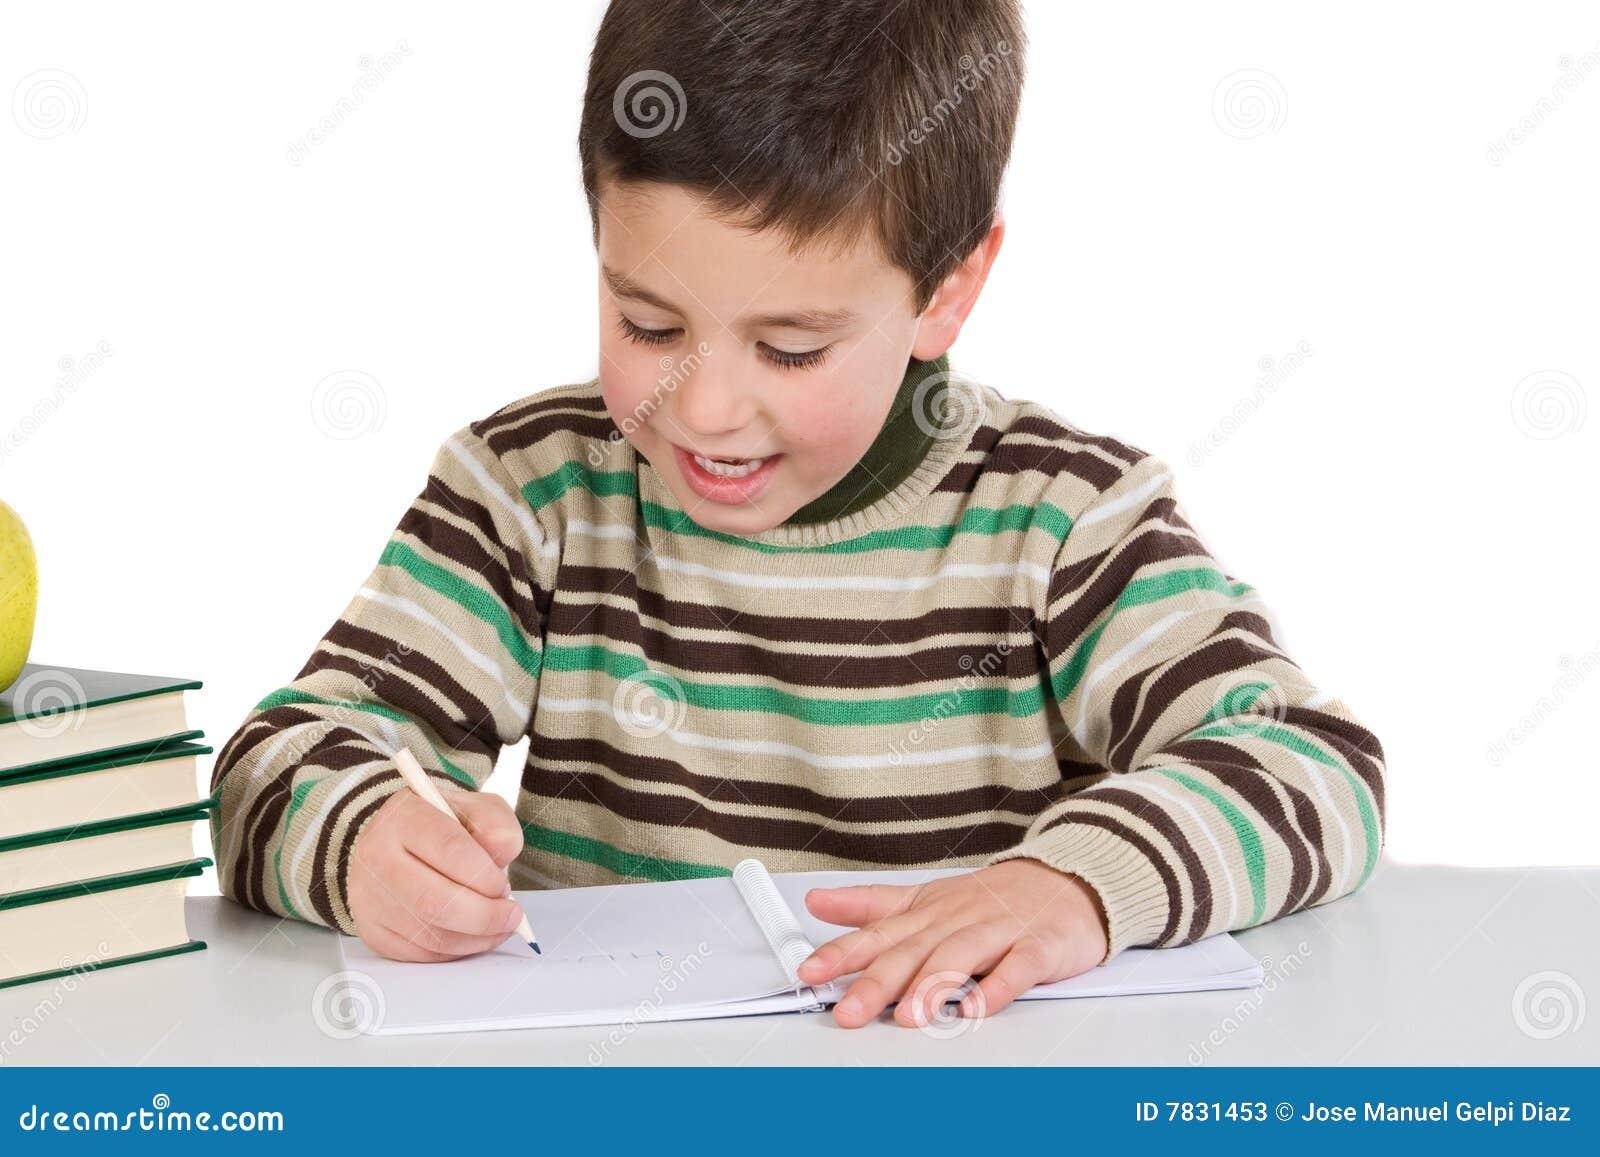 child essay write